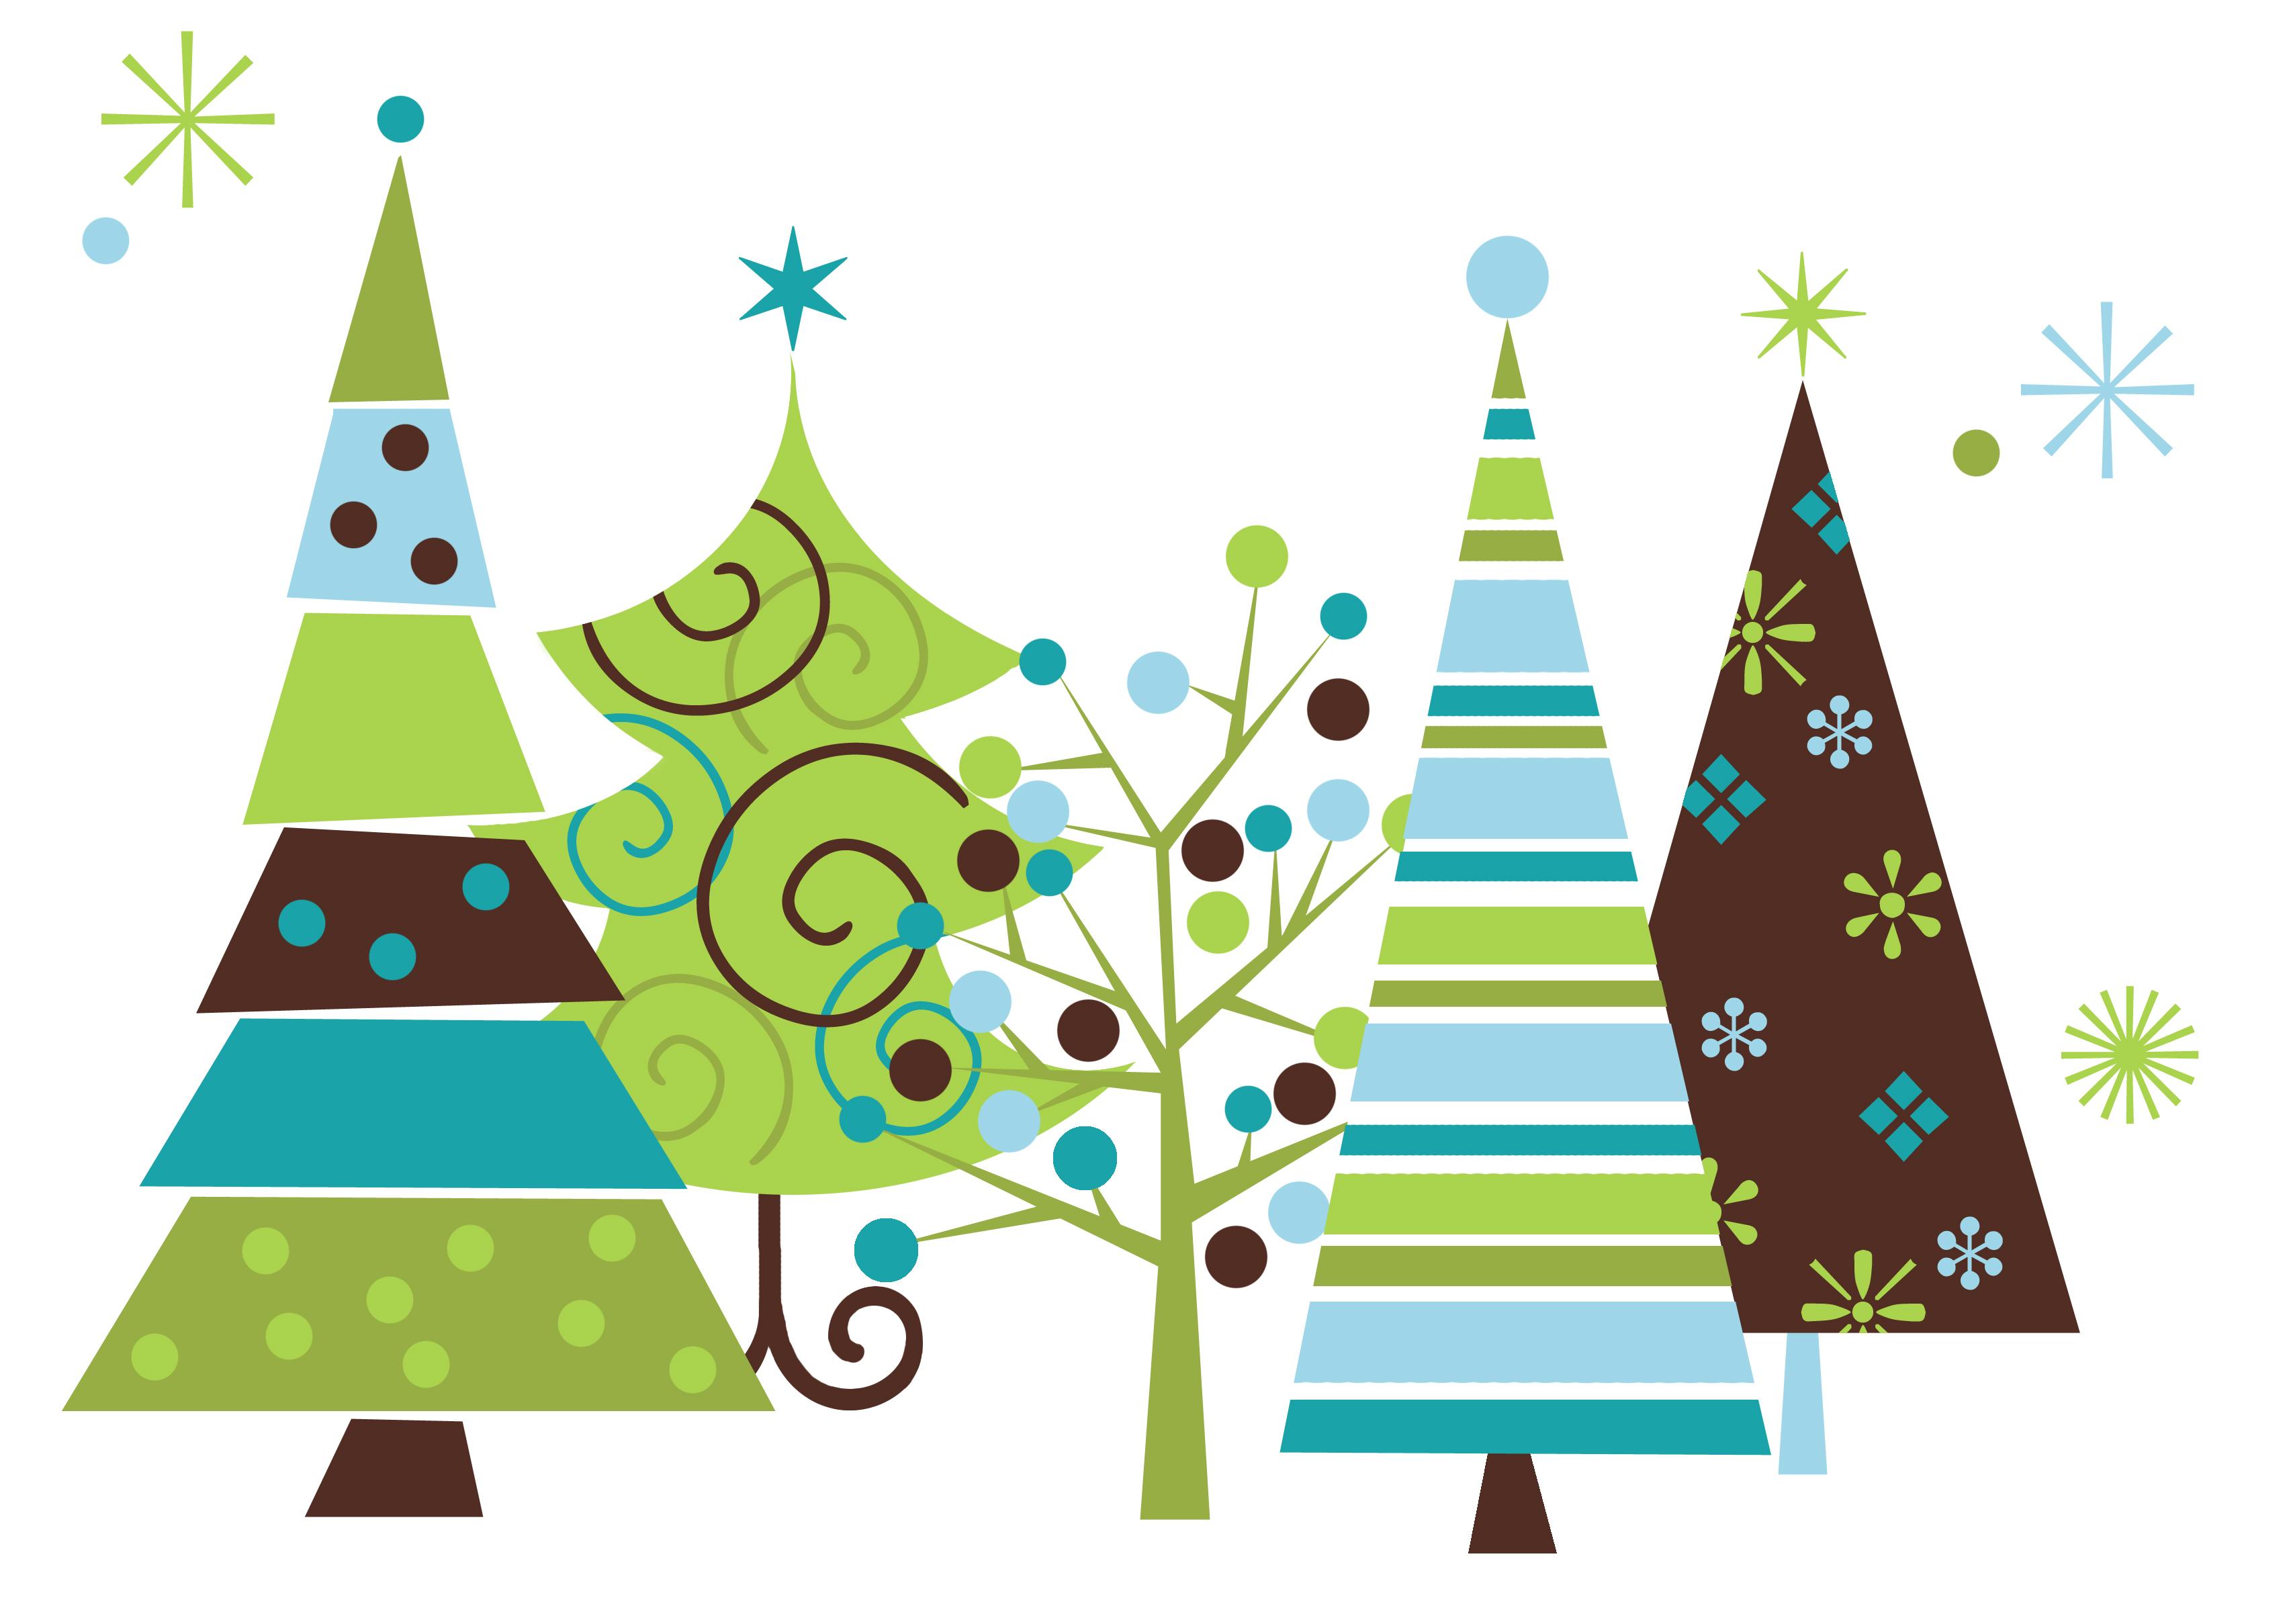 Holiday bazaar clipart banner stock Christmas Craft Fair and Bazaar - Clip Art Library banner stock